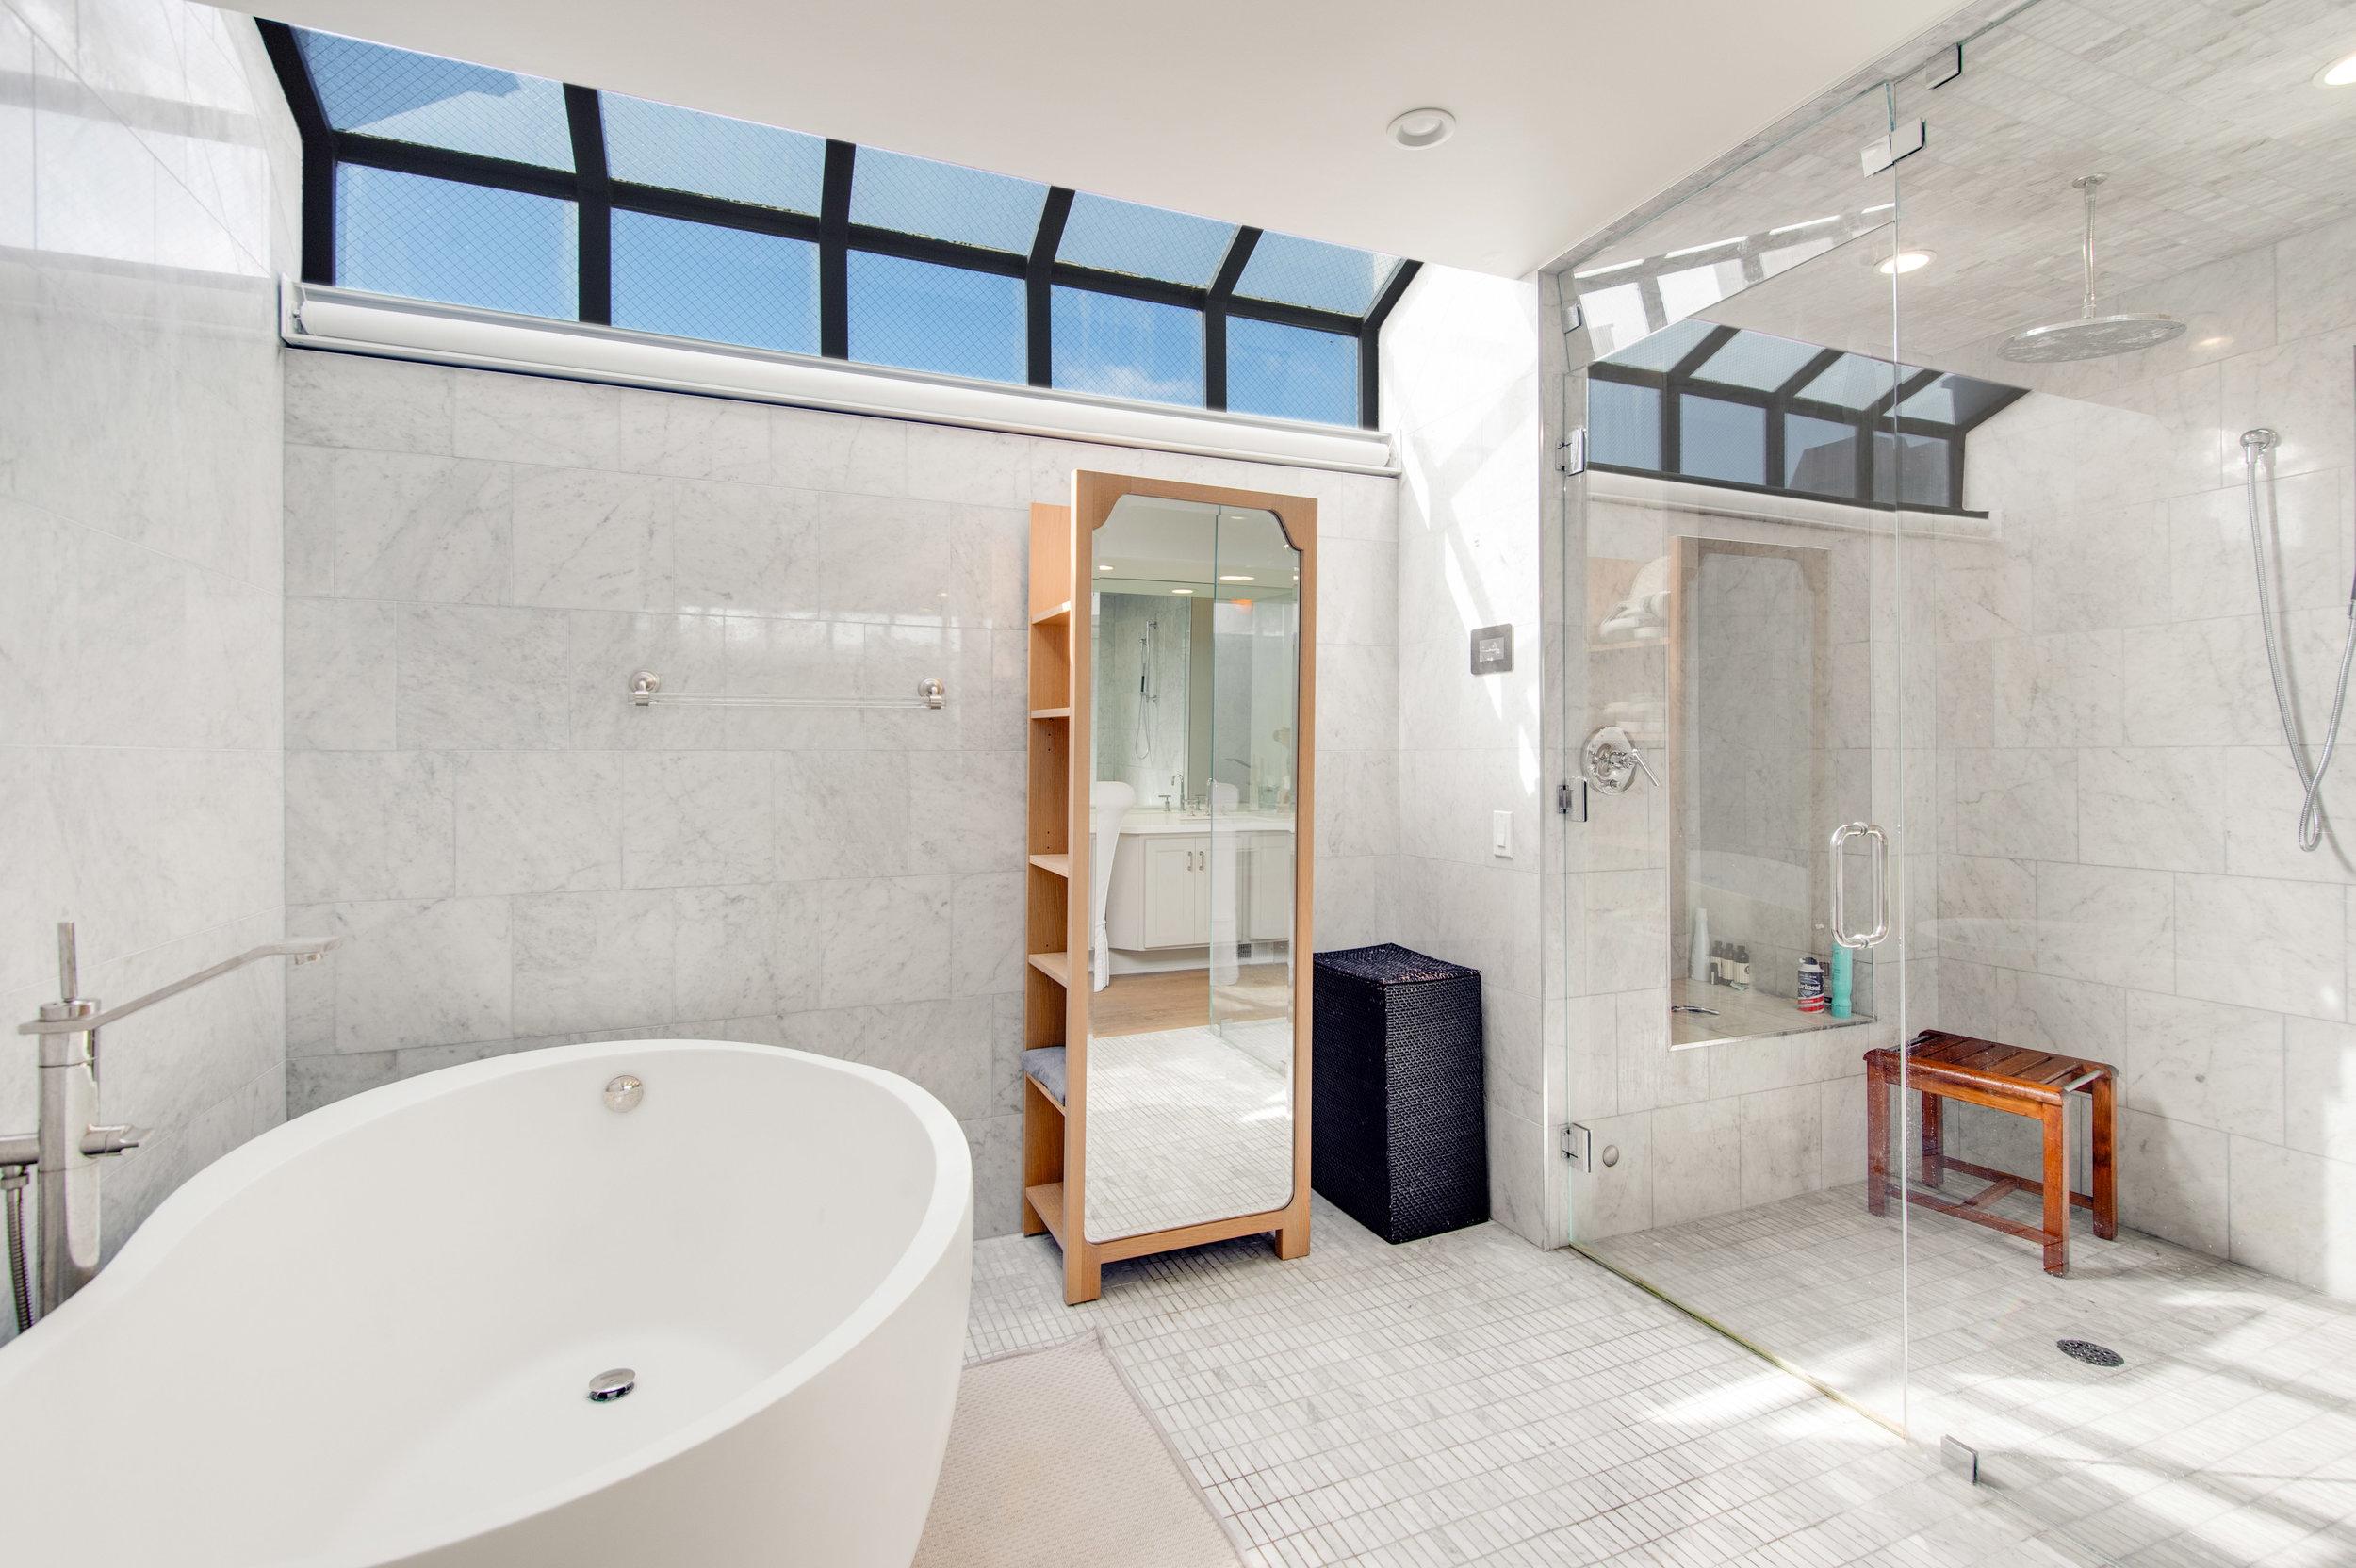 018 Master Bathroom 25252 Malibu Road For Sale Lease The Malibu Life Team Luxury Real Estate.jpg